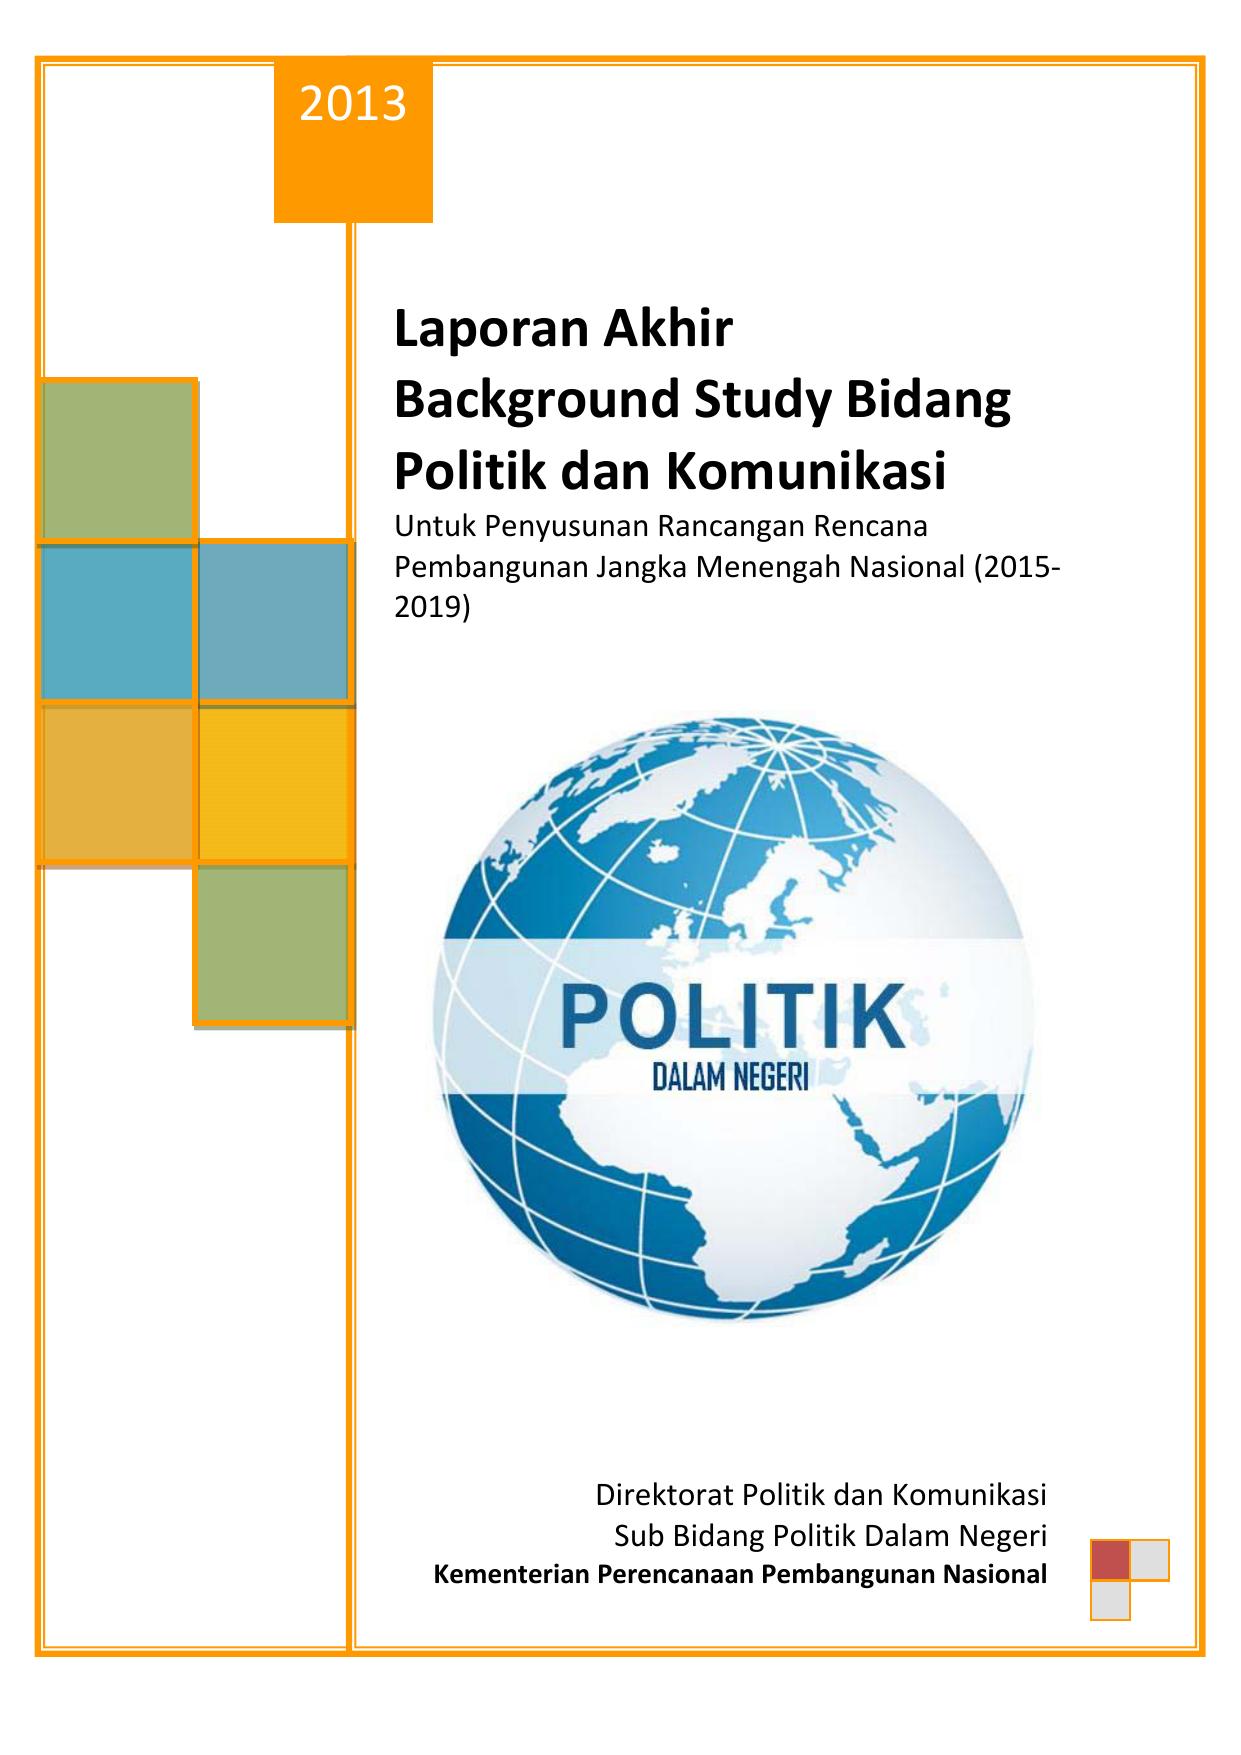 Laporan Akhir Background Study Bidang Politik Dan Komunikasi